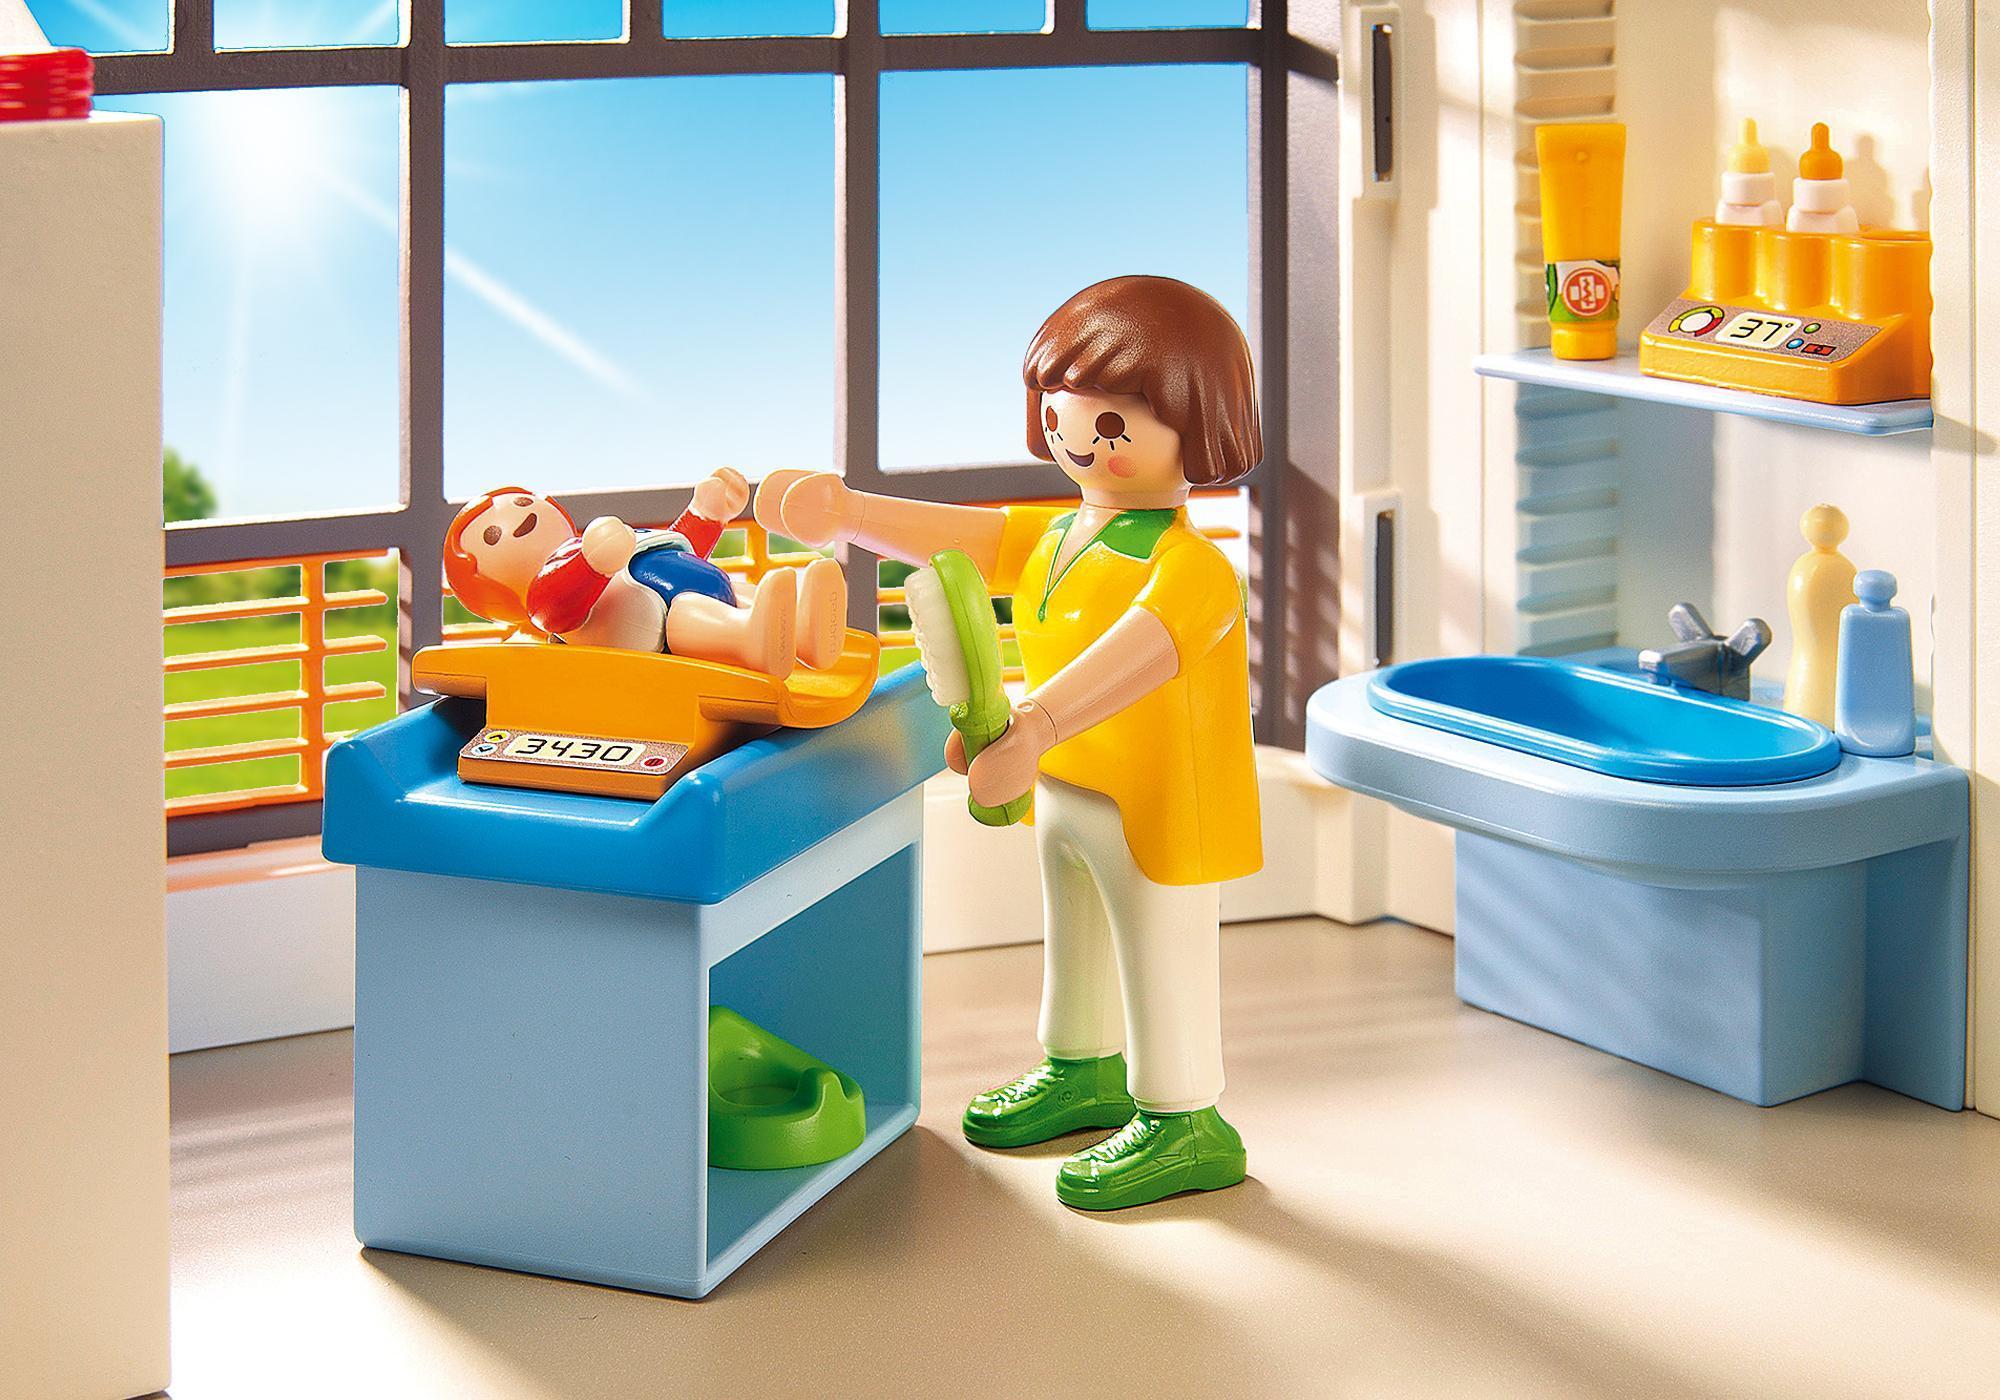 http://media.playmobil.com/i/playmobil/6657_product_extra3